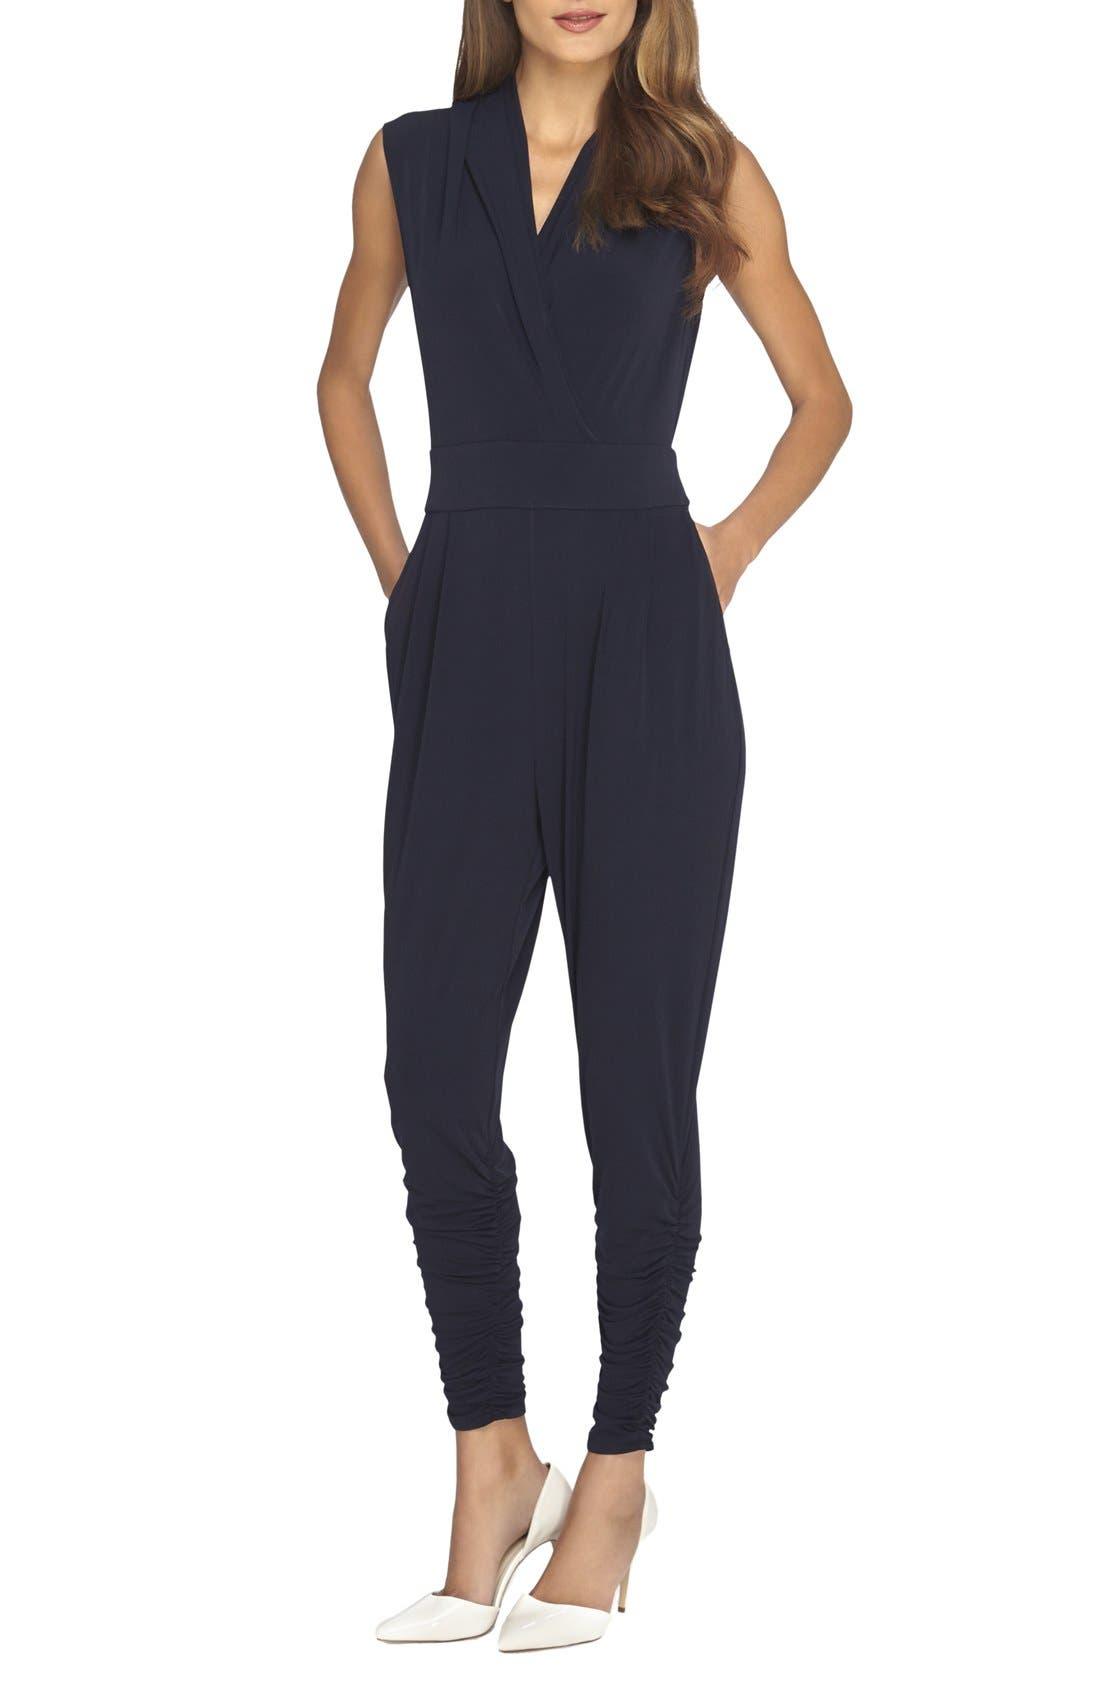 Alternate Image 1 Selected - Catherine Catherine Malandrino 'Graham' Sleeveless Jumpsuit